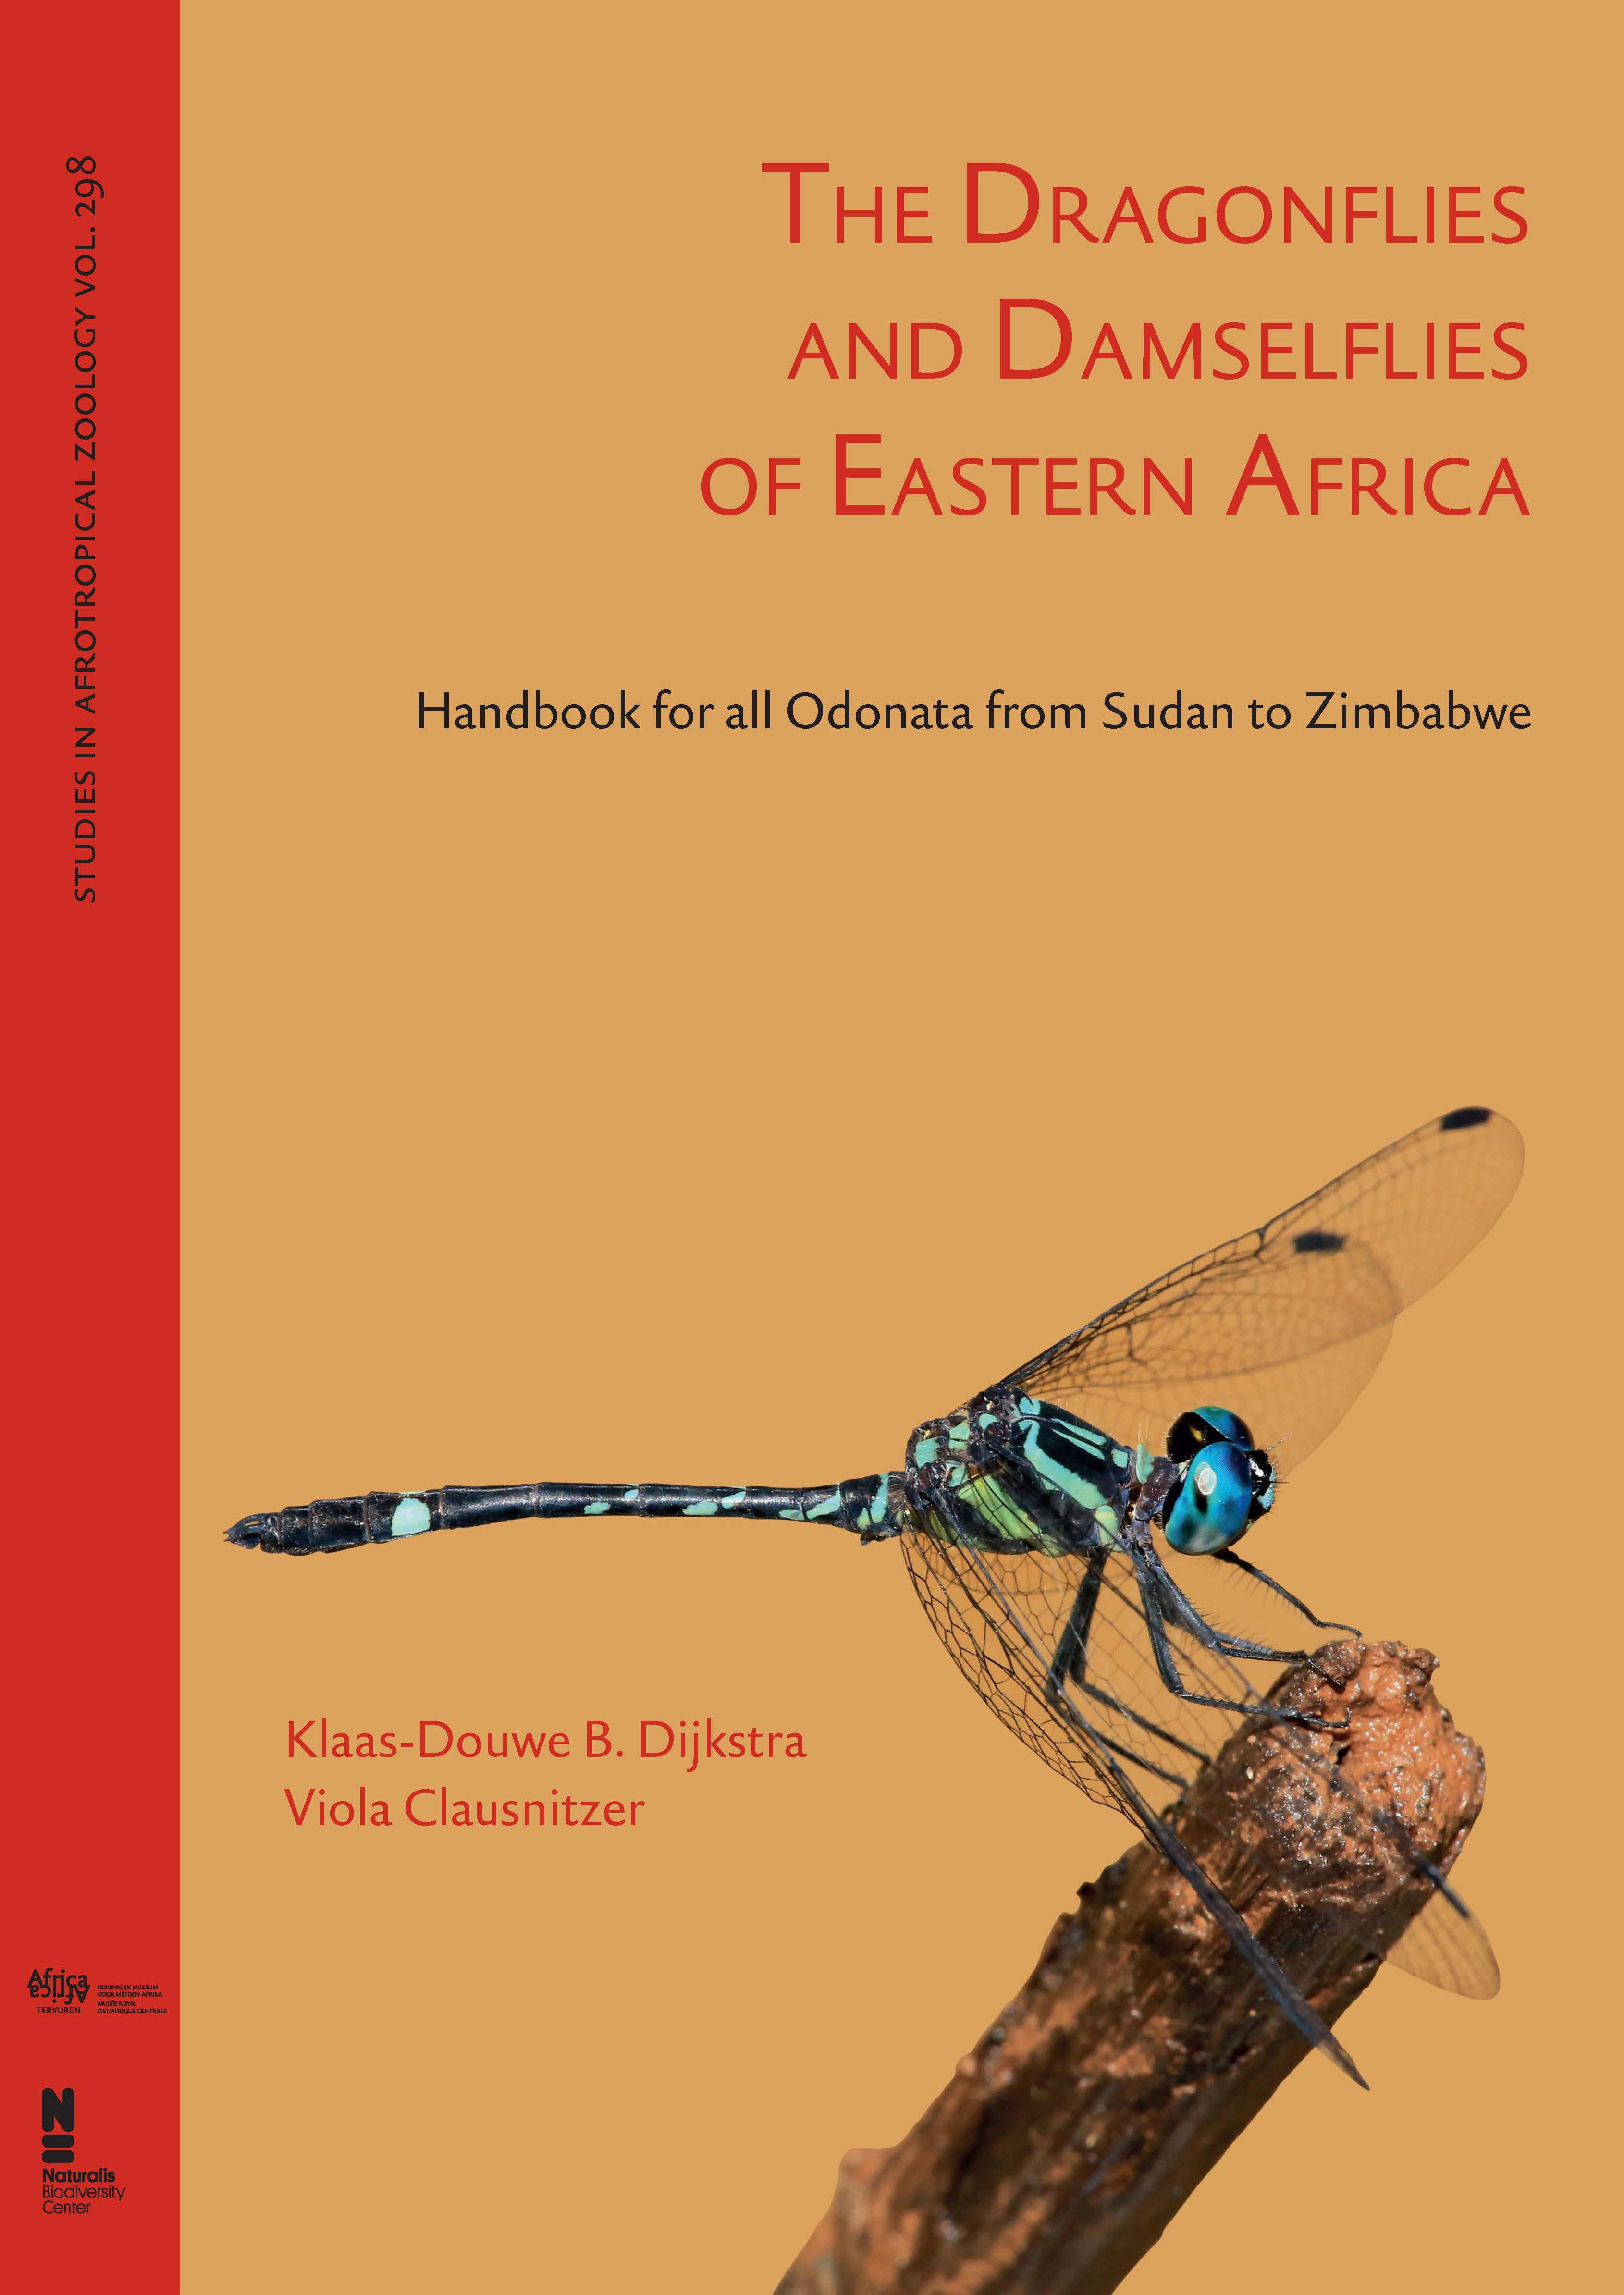 Discovering the dragonflies and damselflies of eastern africa dijkstraclausnitzer2014dragonflieseasternafricacover buycottarizona